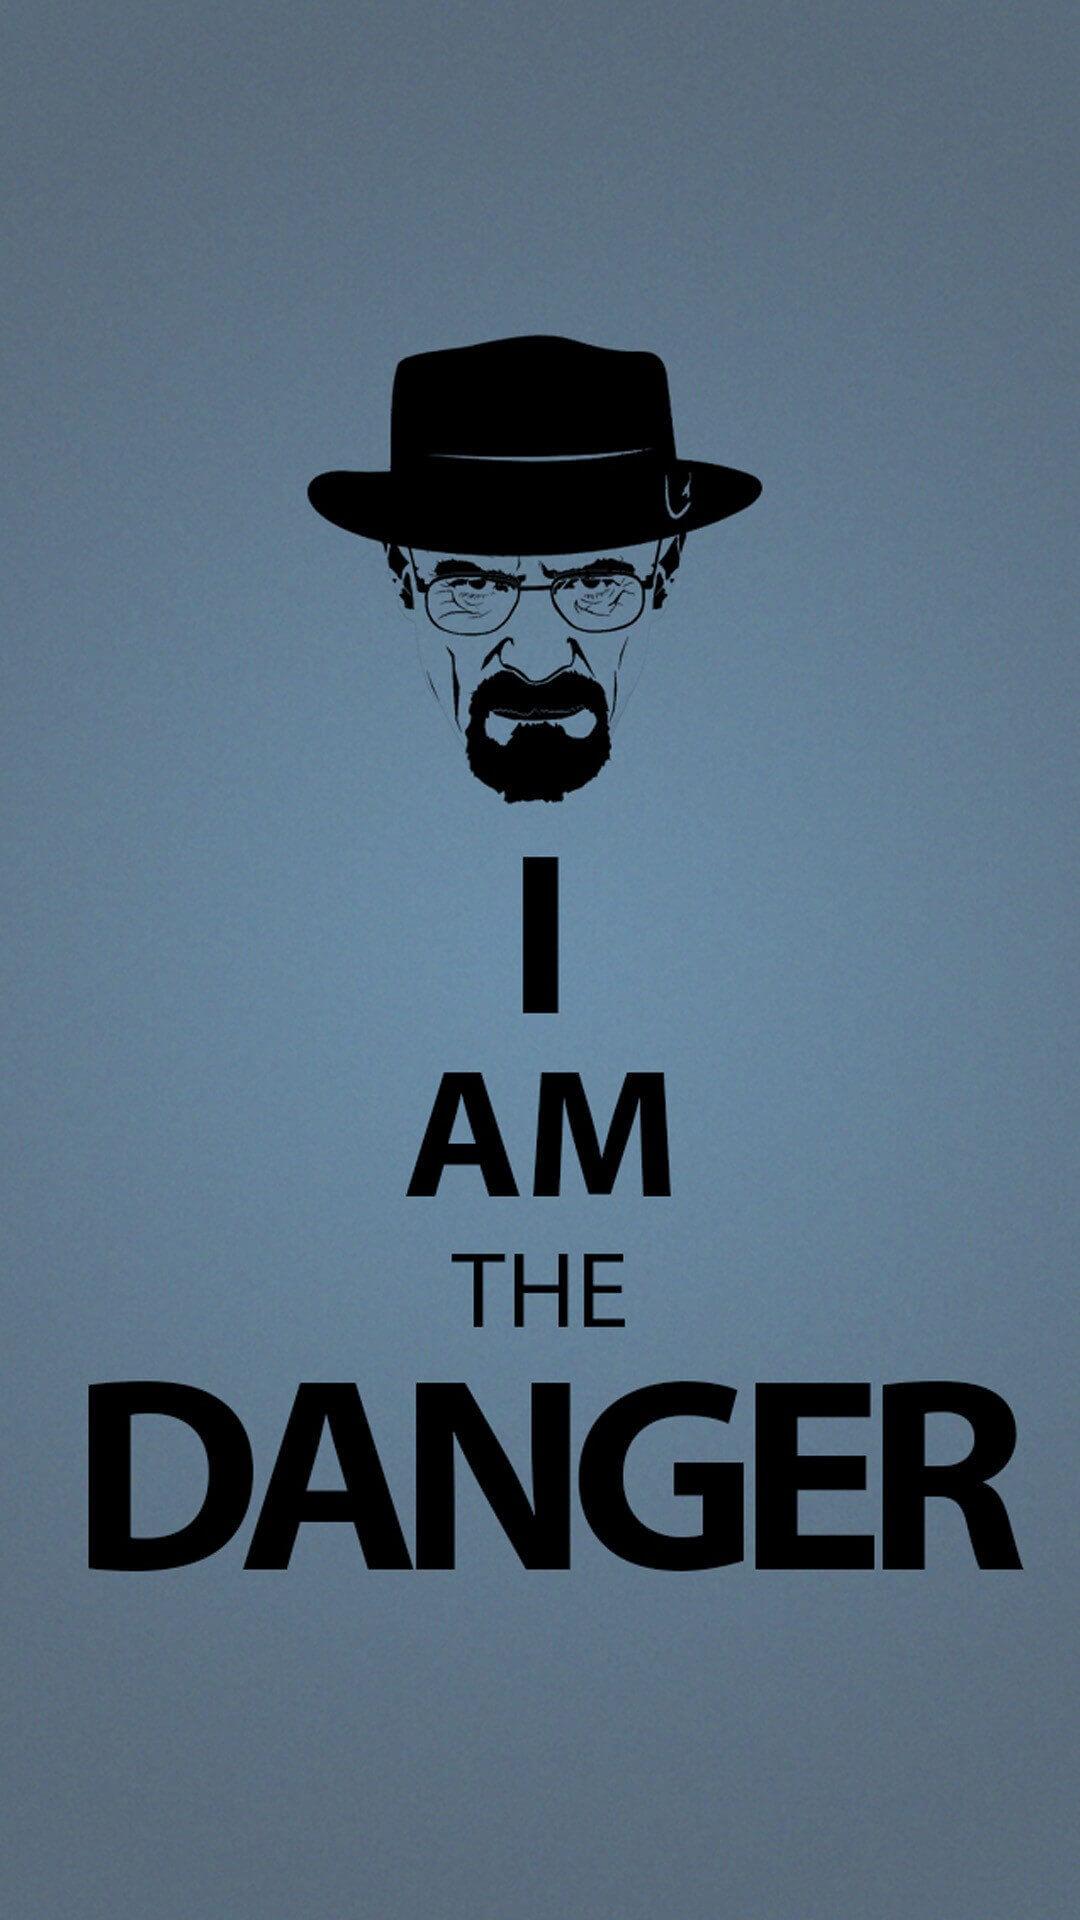 i am the danger | breaking bad | iphone wallpaper